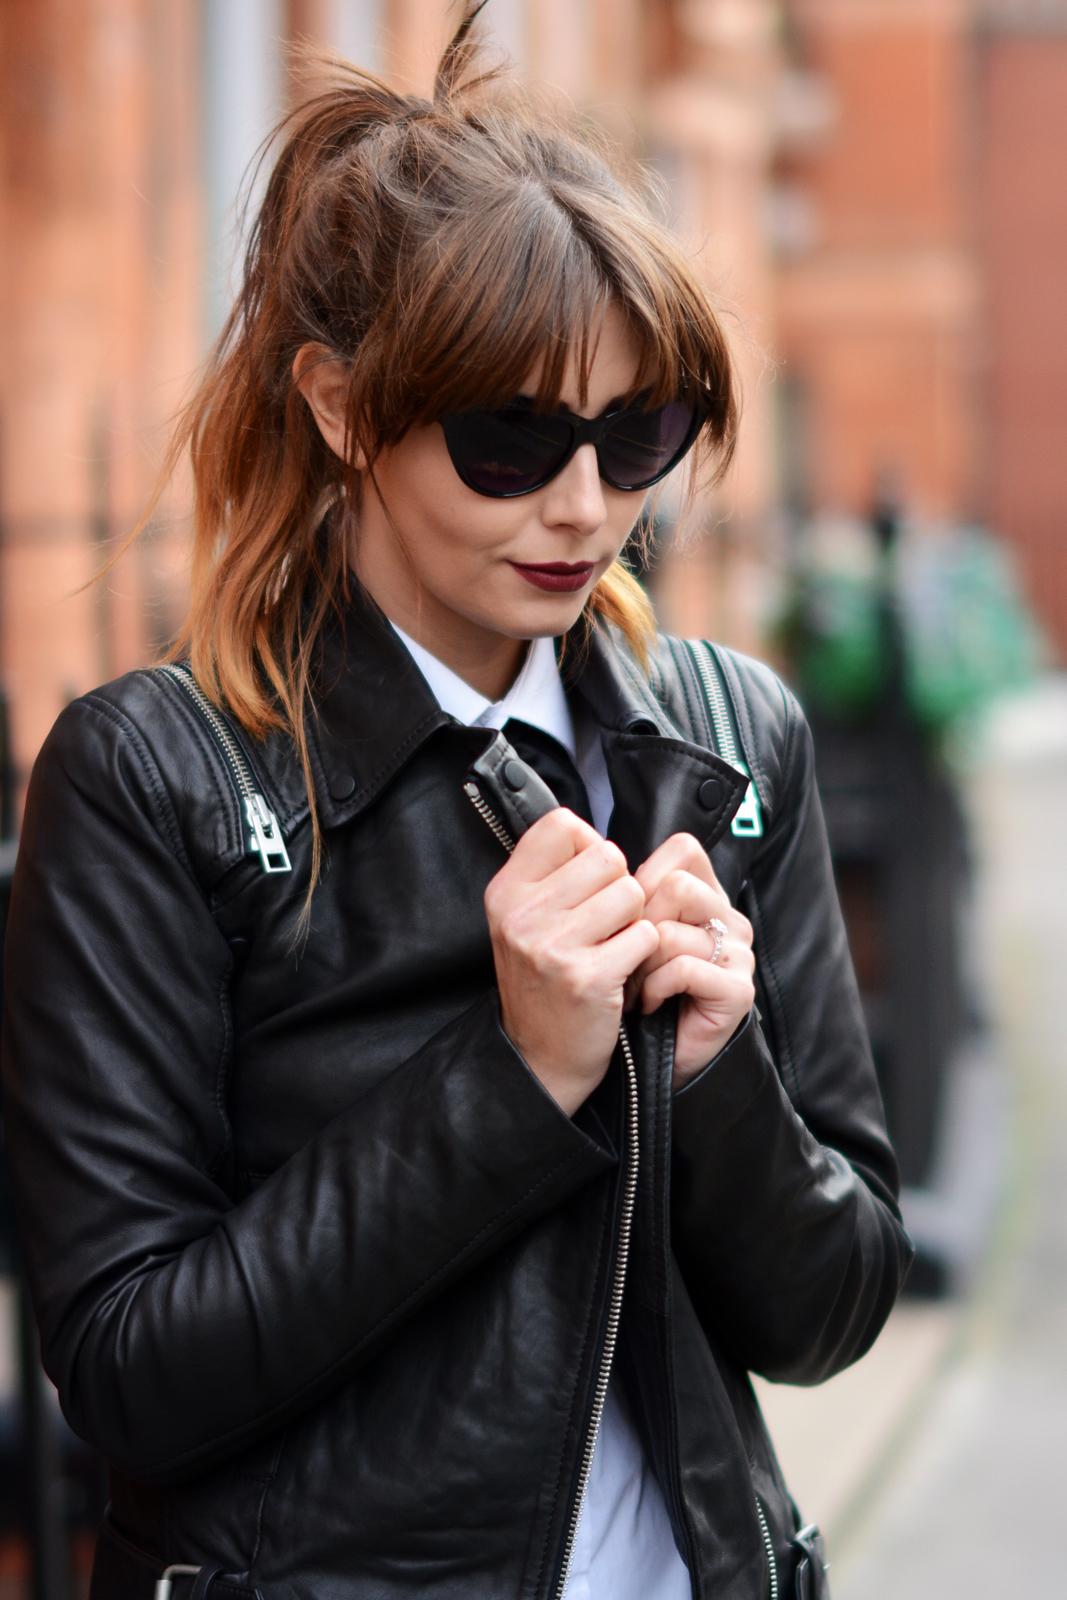 EJSTYLE - Black bowtie, all saints leather biker jacket, white shirt, the Biker portraits, vampy lips